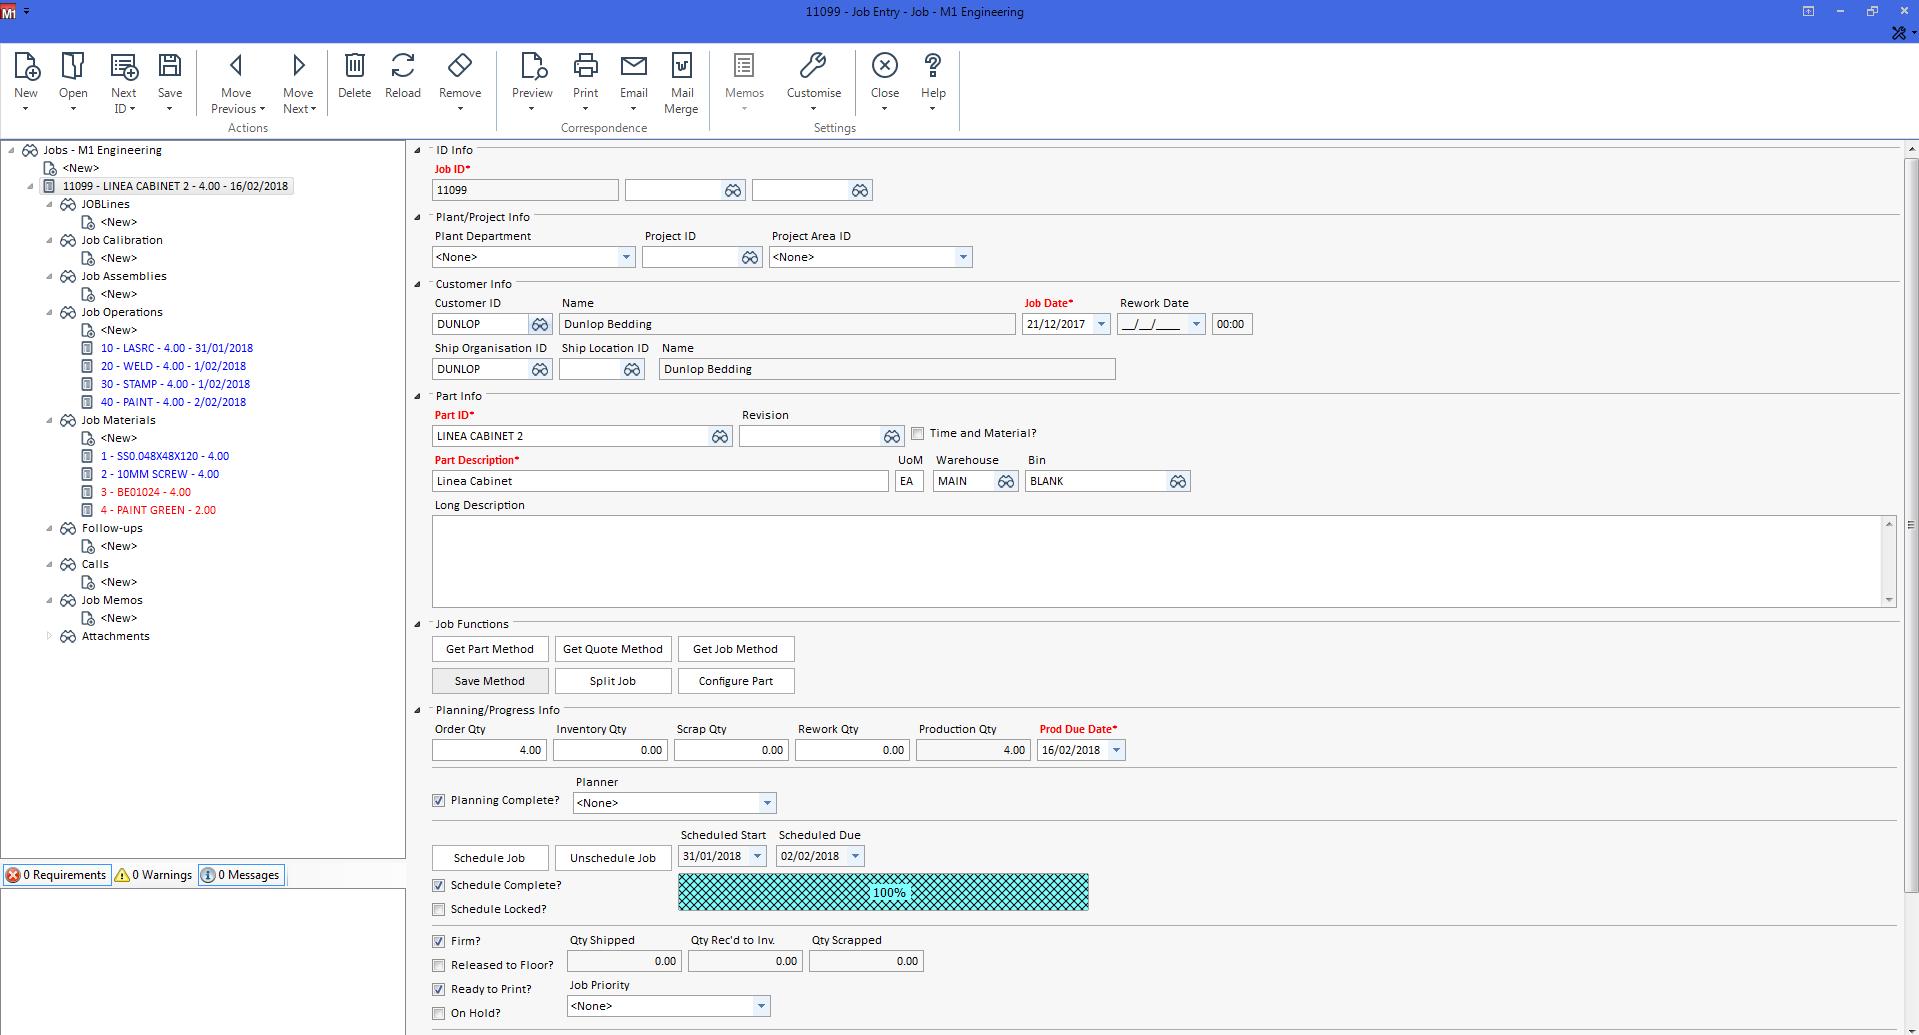 M1 ERP Software - Entry screen